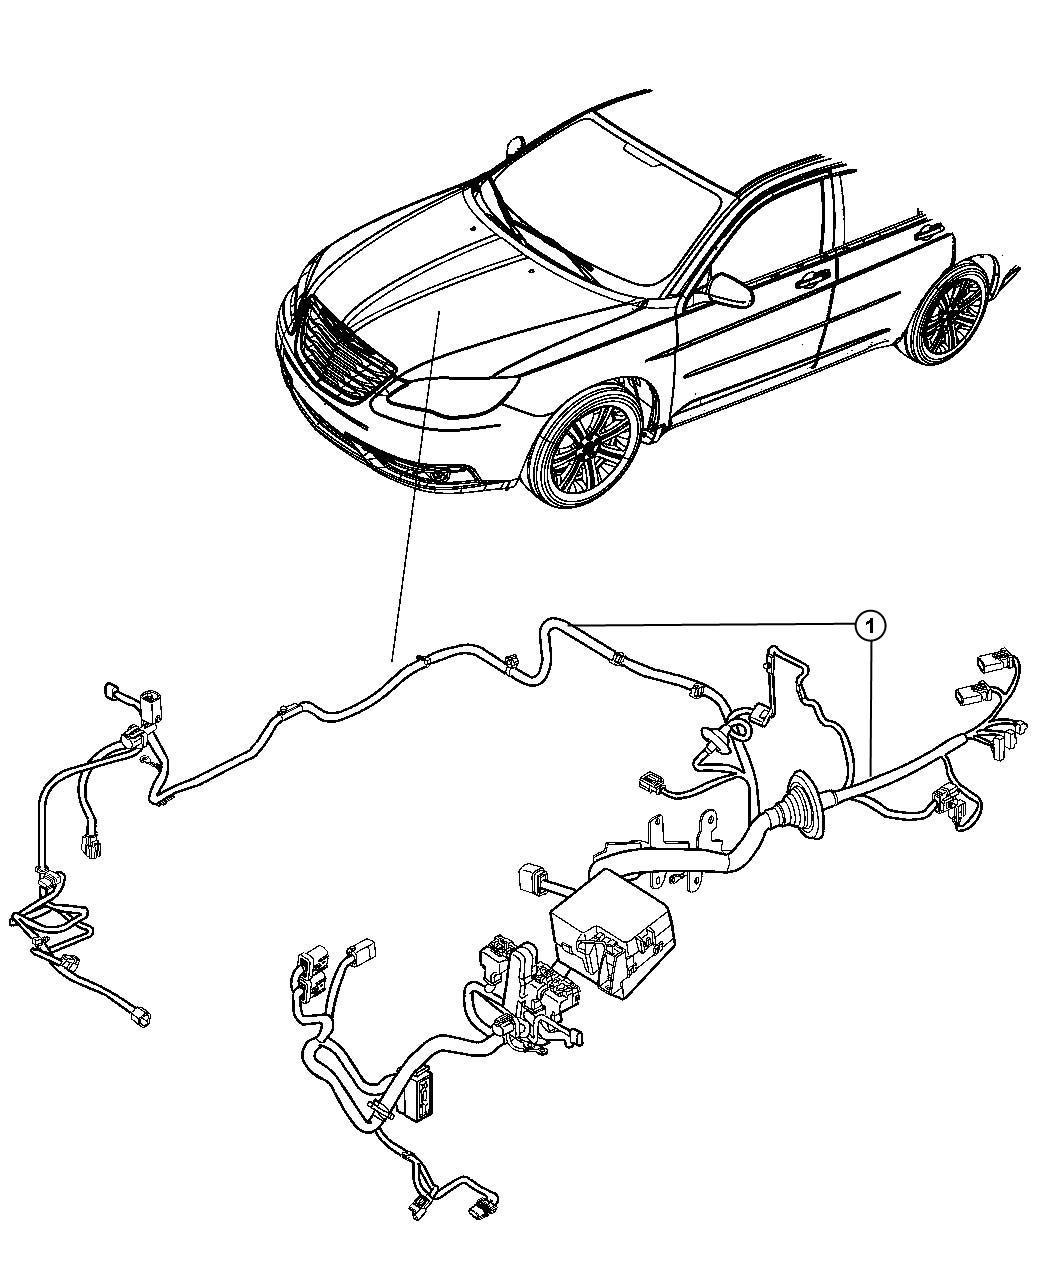 Dodge Avenger Wiring. Headlamp to dash. Mopar, electrical